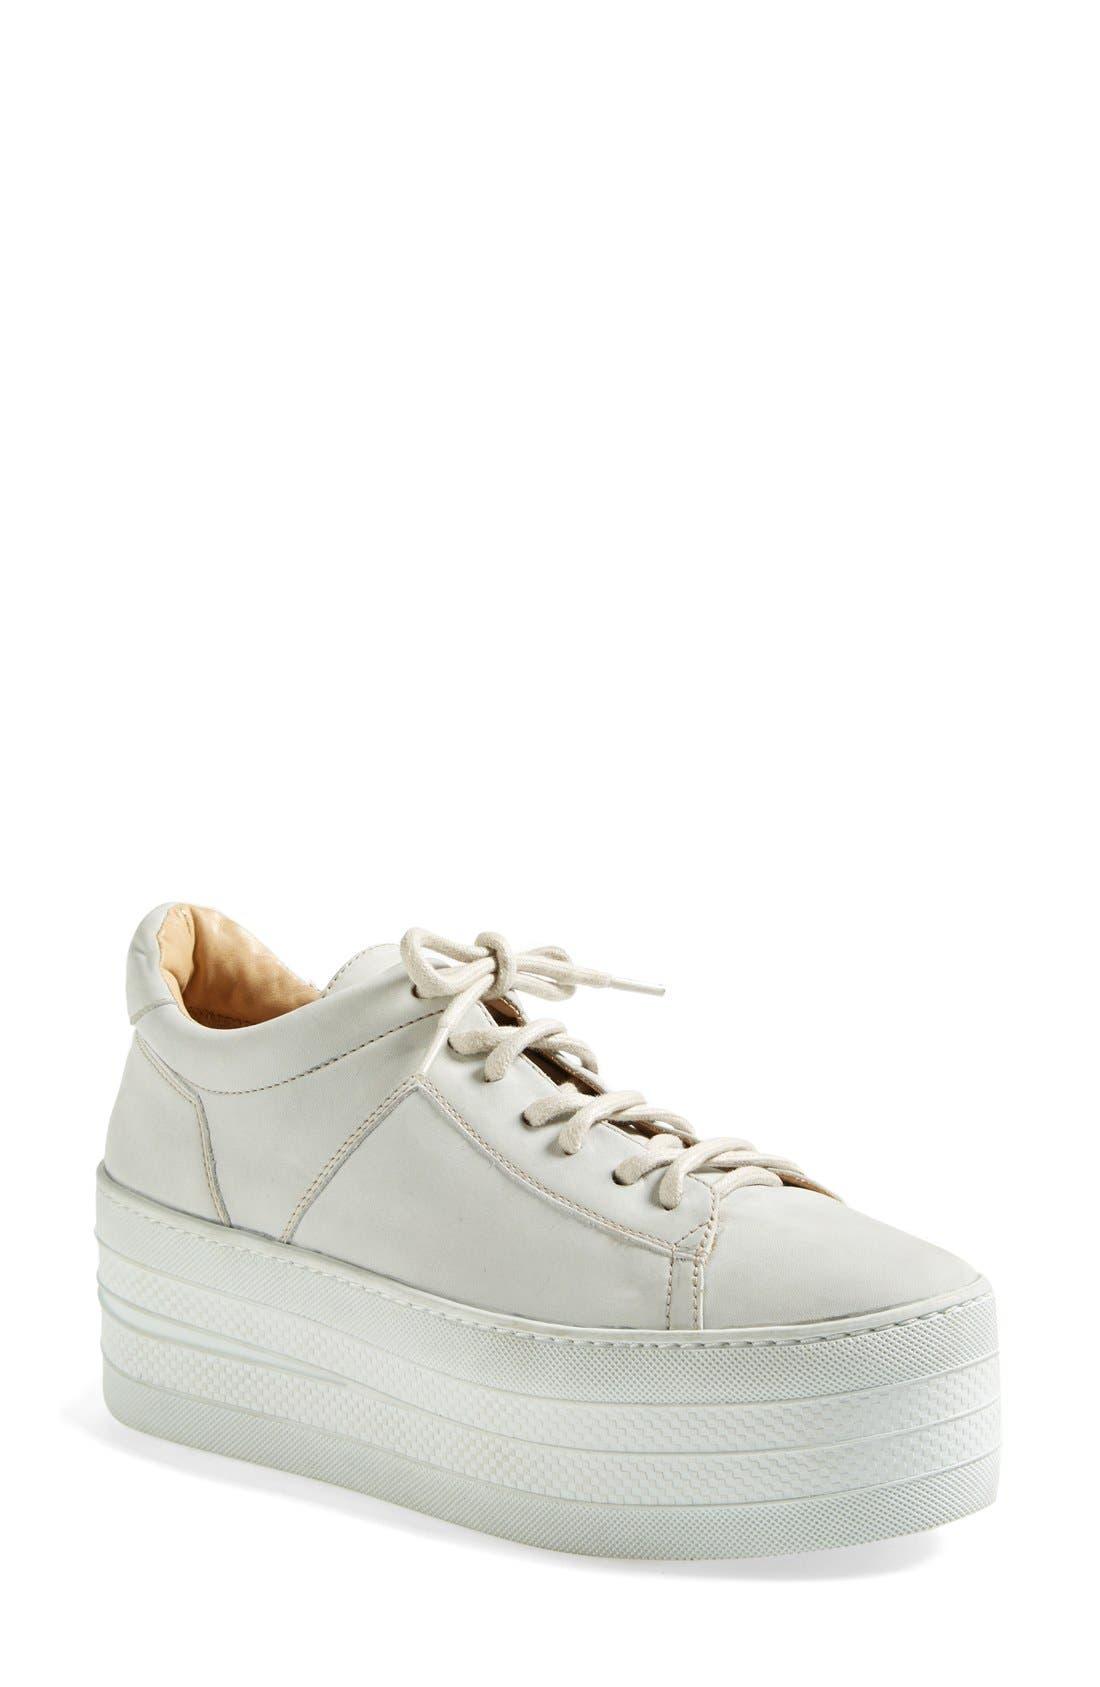 Alternate Image 1 Selected - Free Lance 'Skyla' Platform Sneaker (Women)